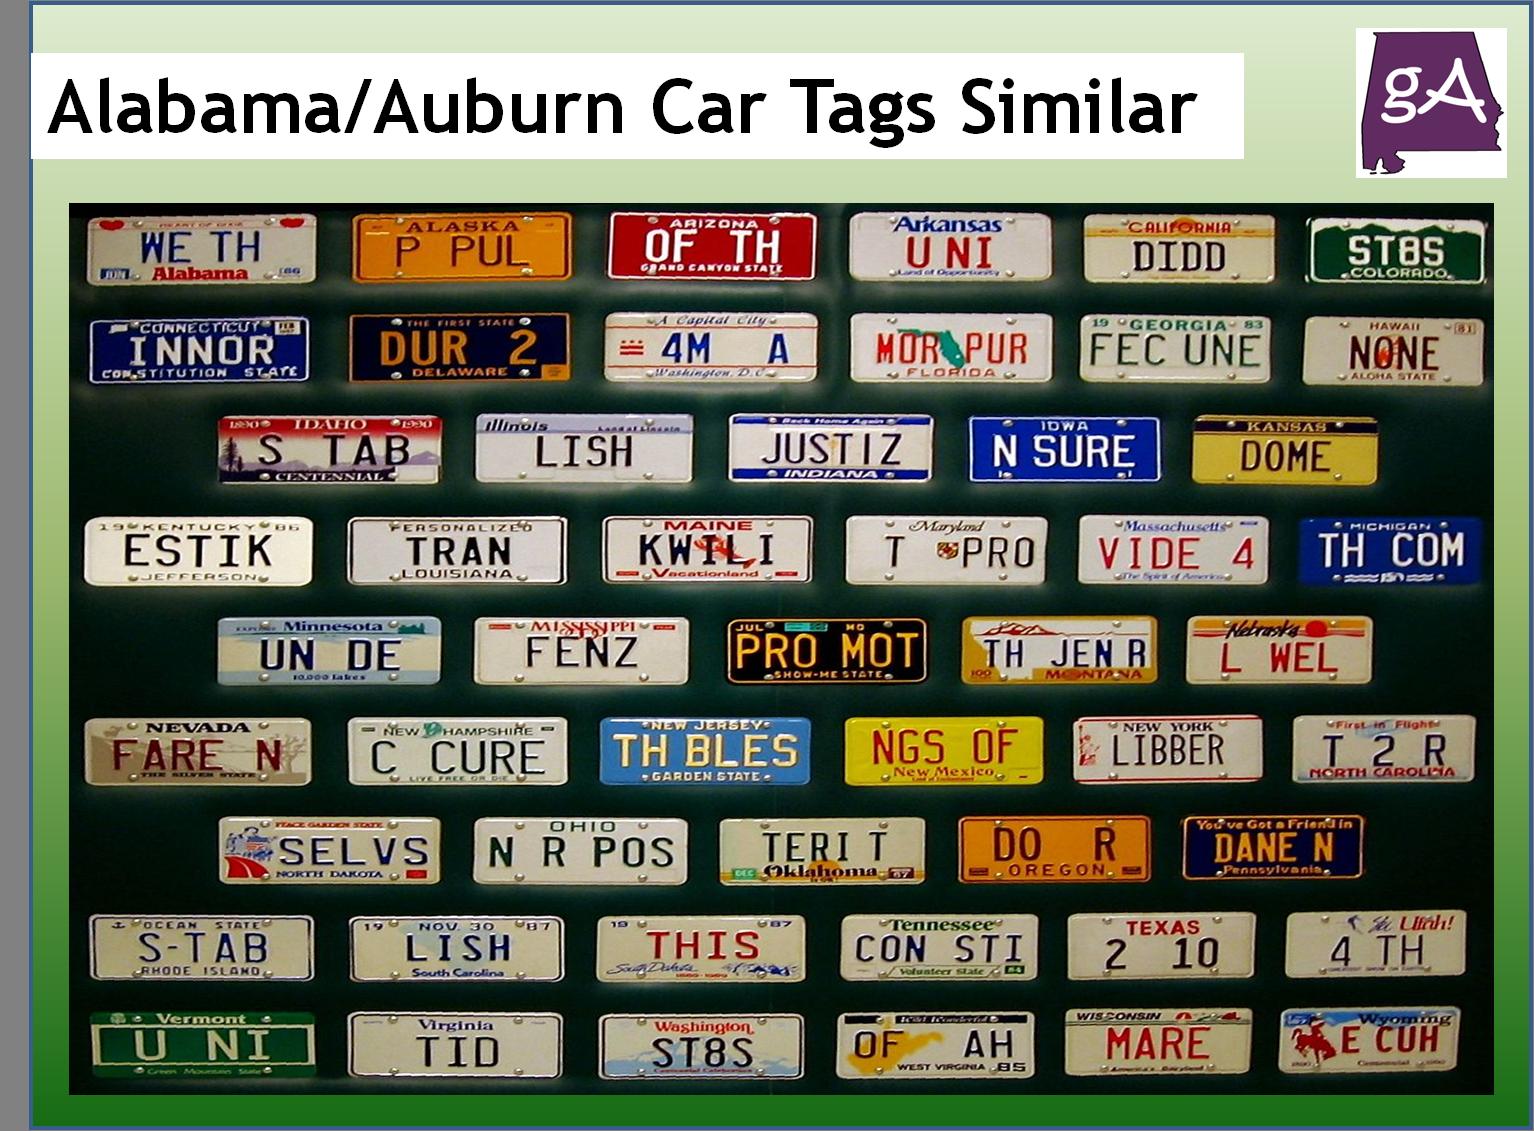 Alabama Car Tags >> Why Do The New Alabama And Auburn Car Tags Look Similar Geek Alabama